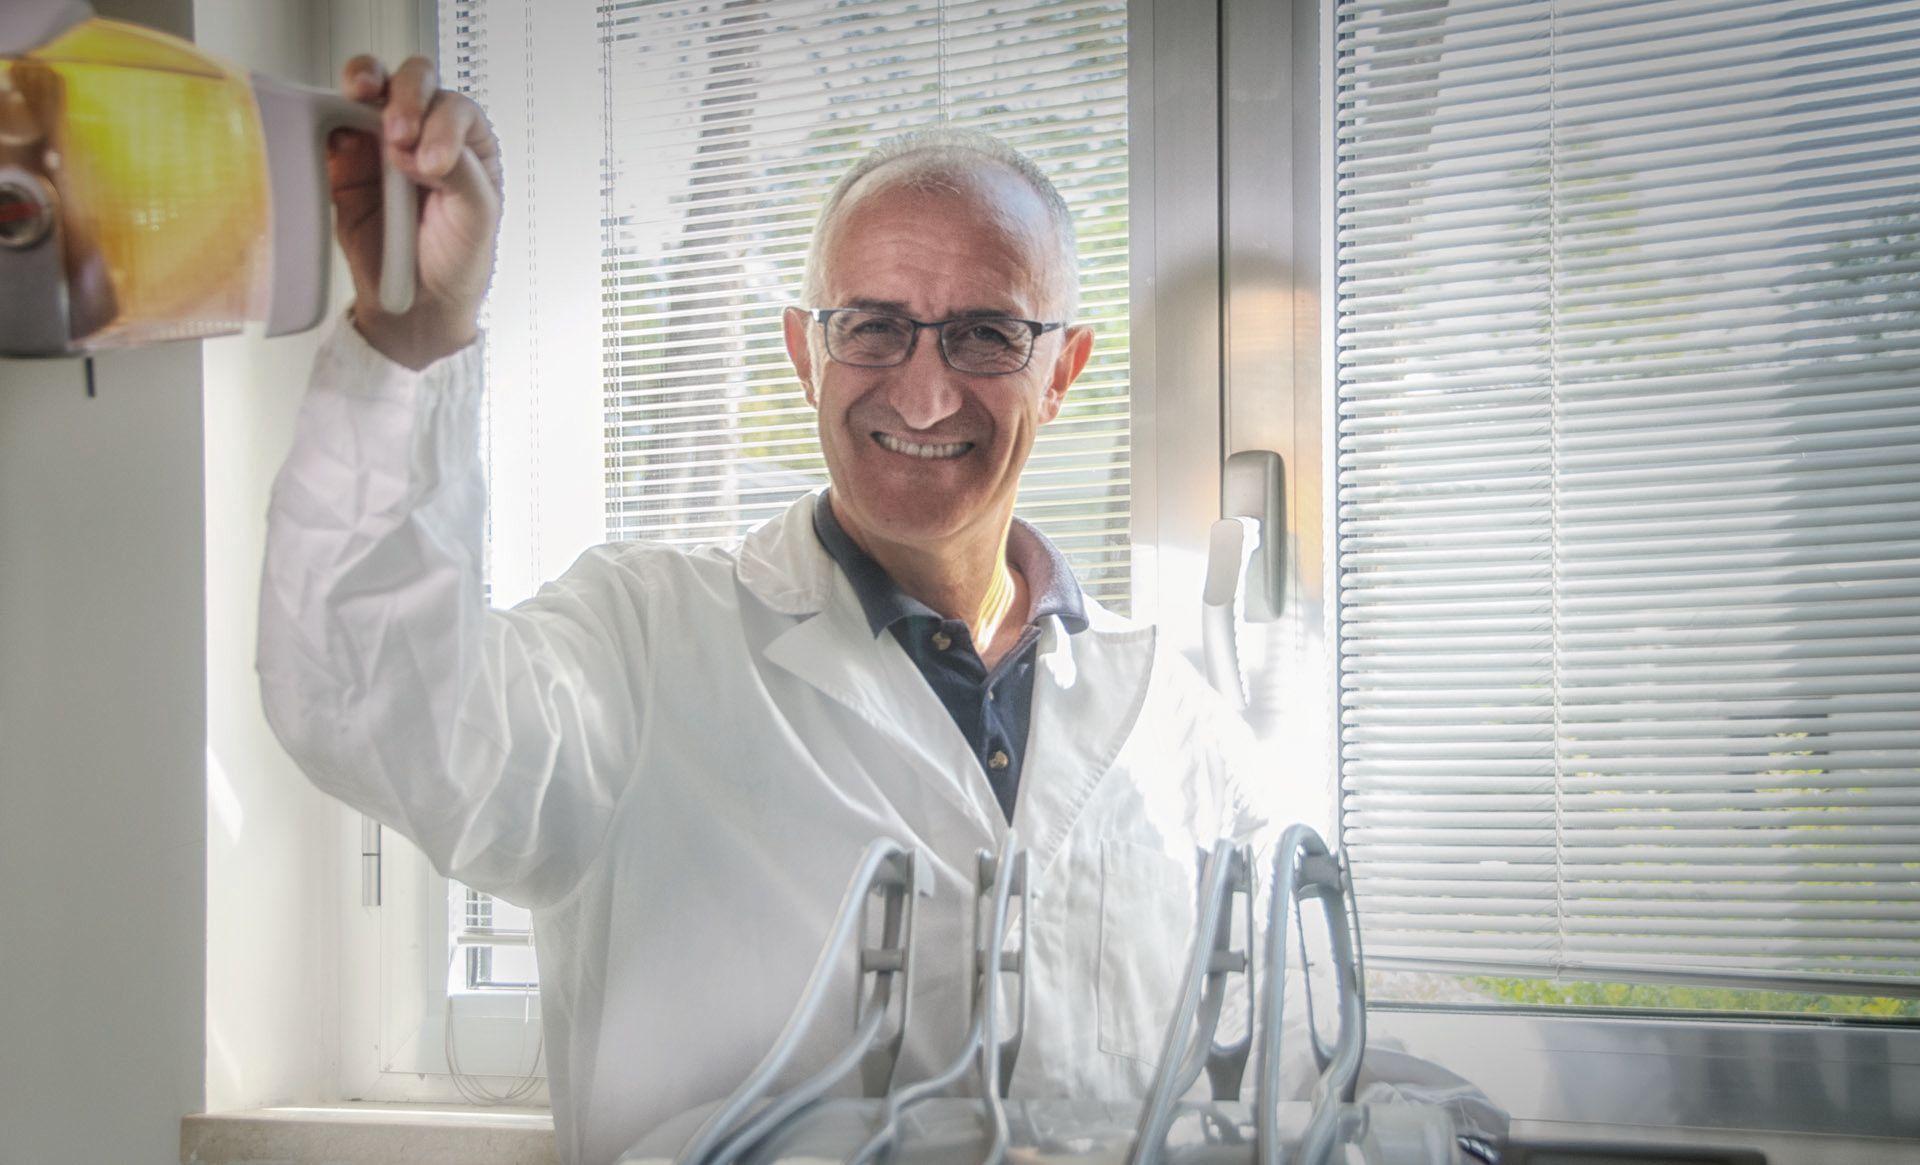 Dr Paolo Benegiamo, Medico-Chirurgo, Ortodontista e Odontoiatra specialista, dentista